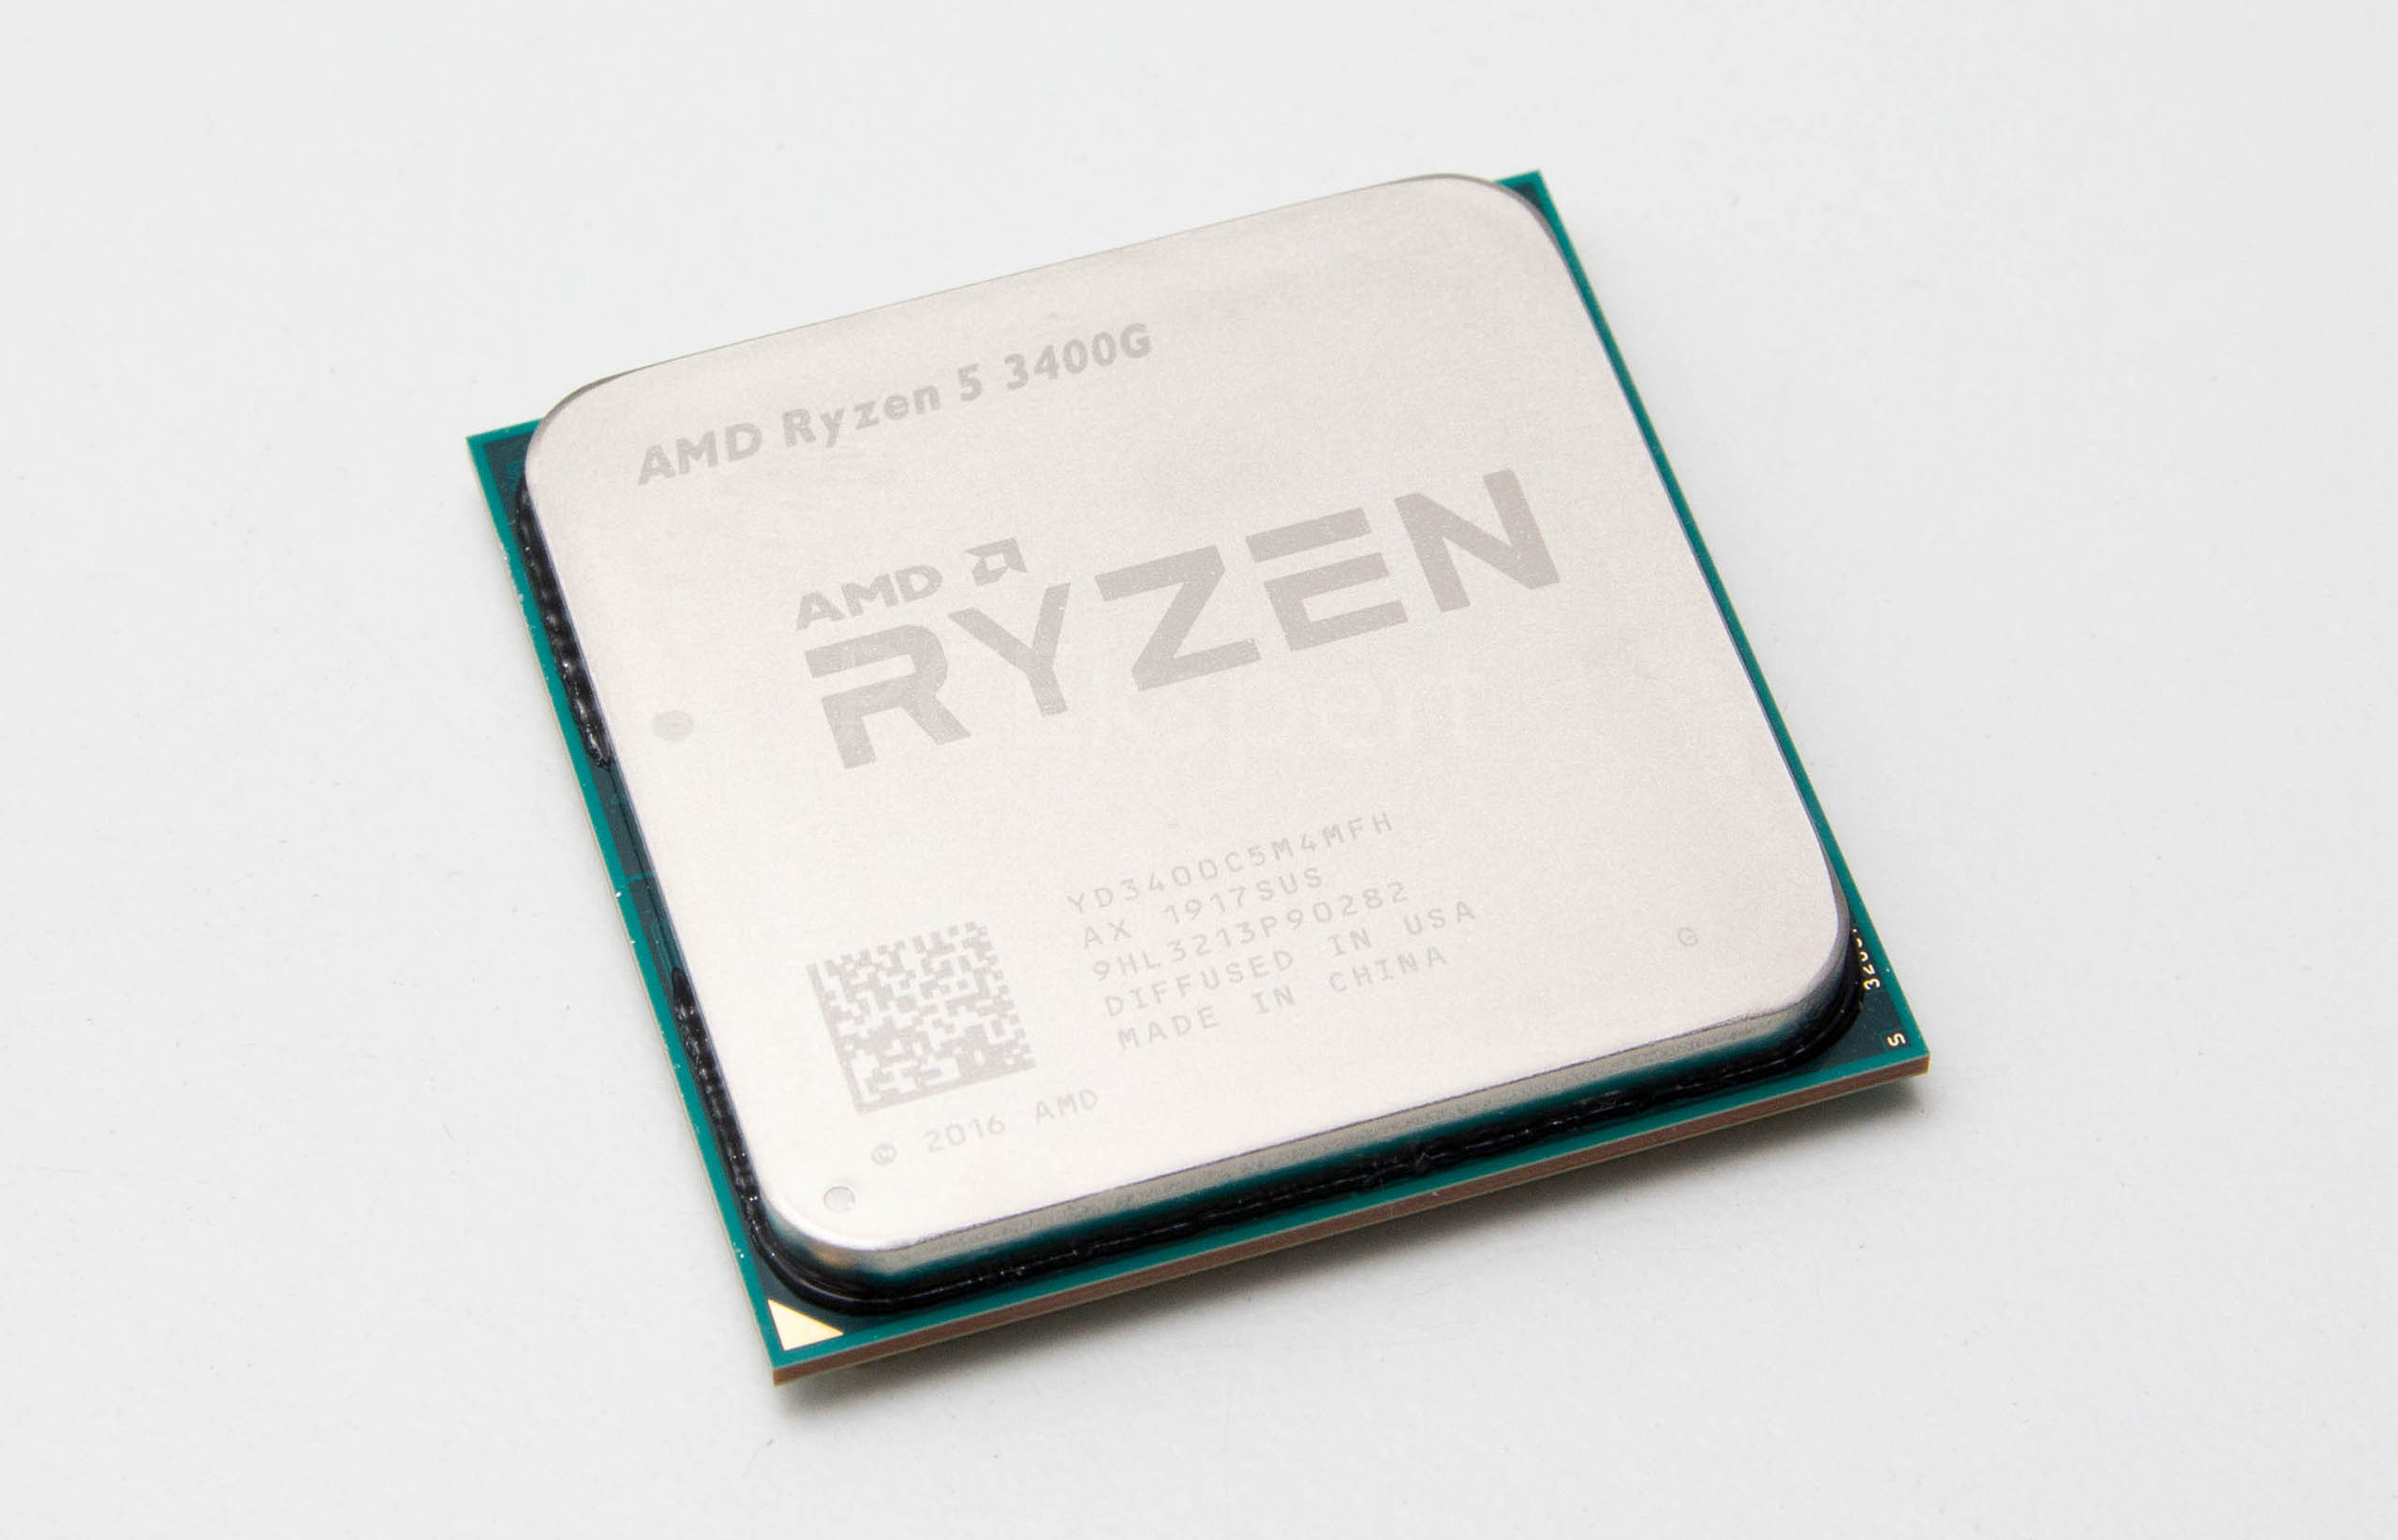 AMD Ryzen 5 3400G recenzija